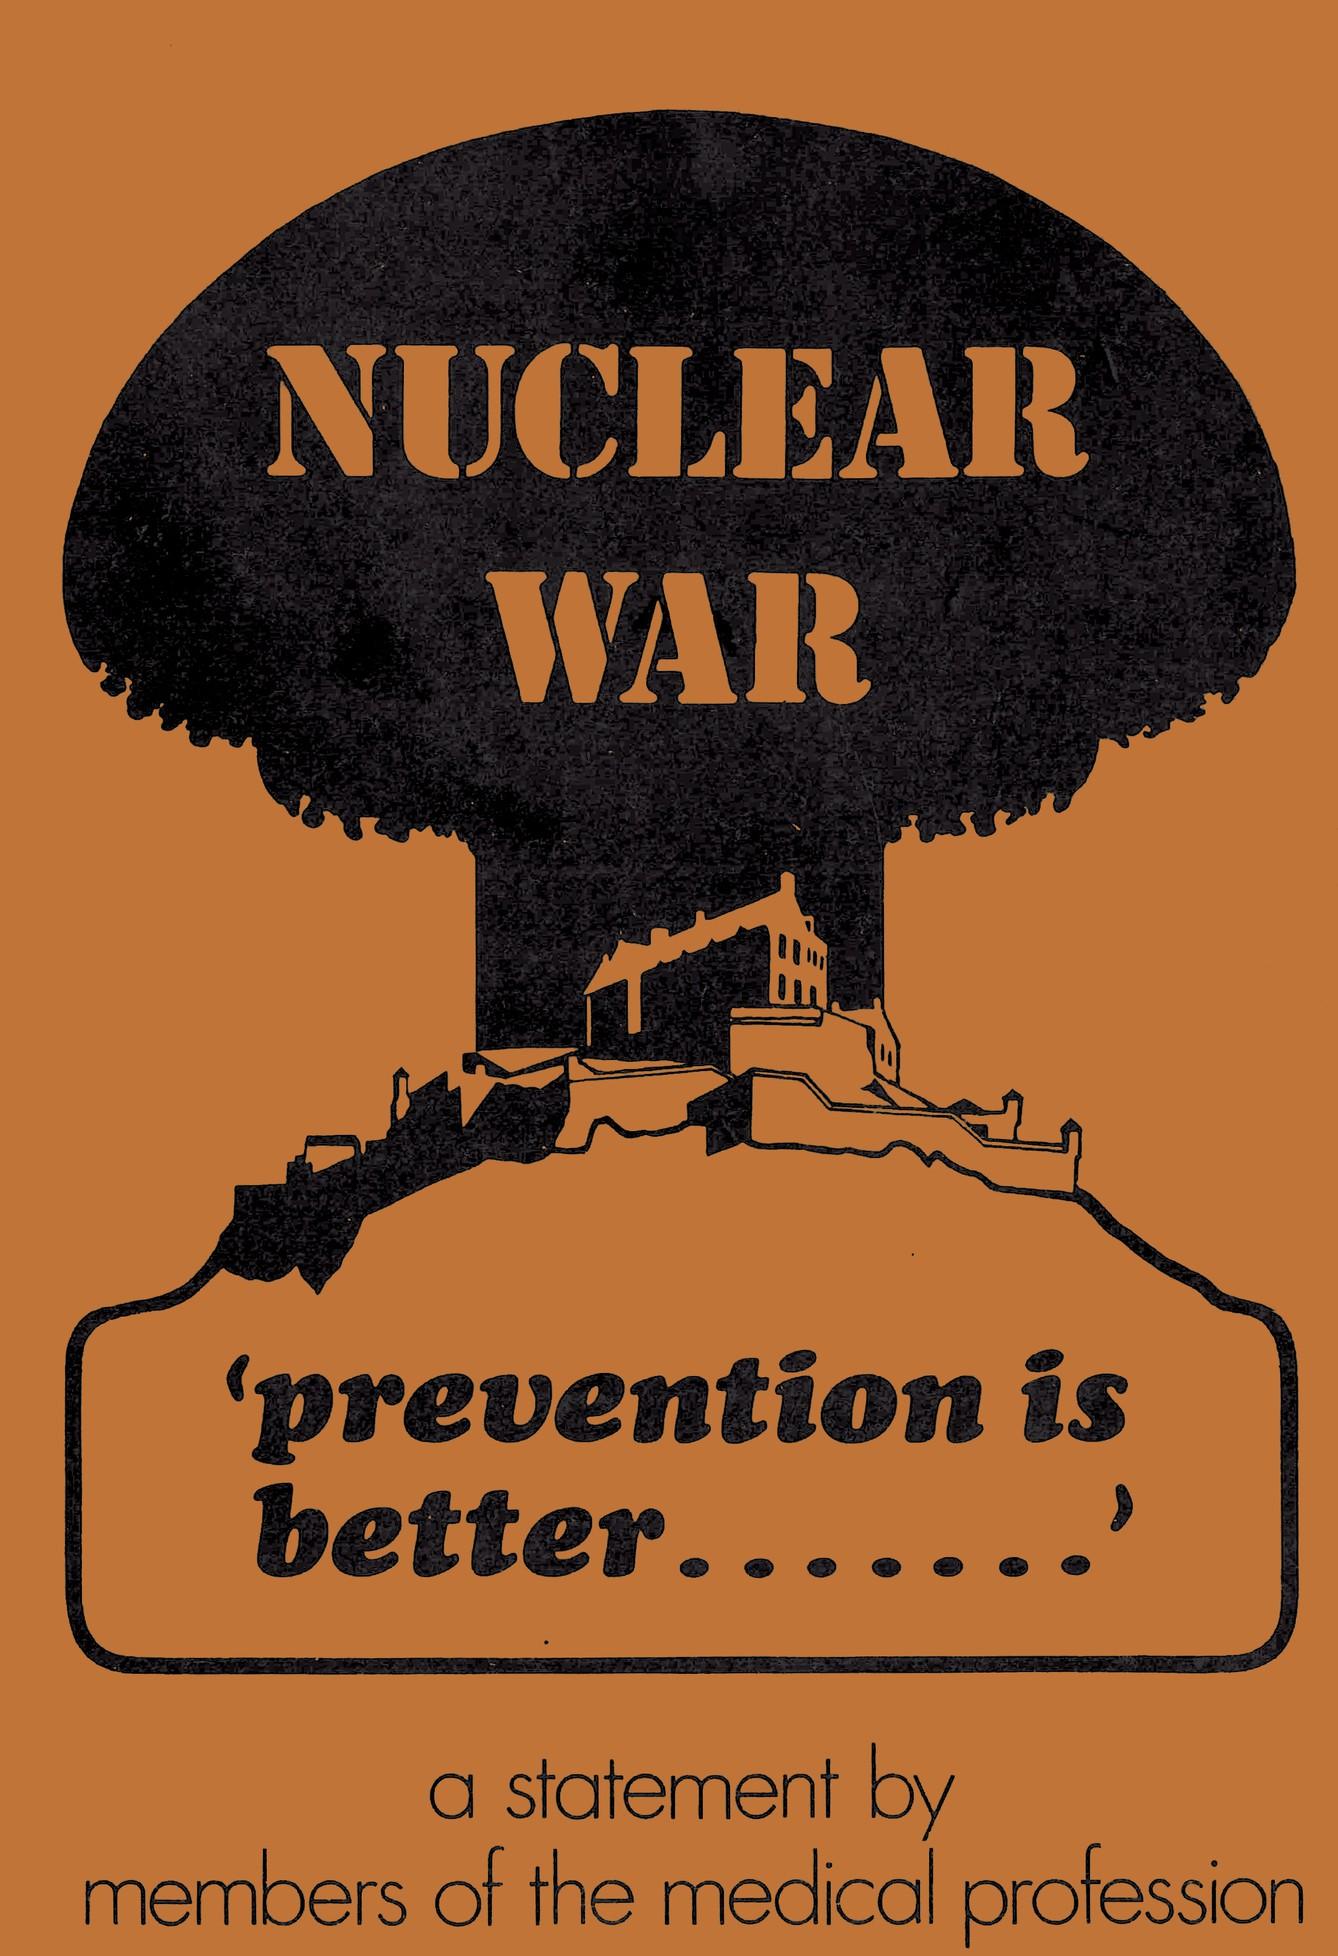 United Kingdom Cold War Nuclear Paranoia